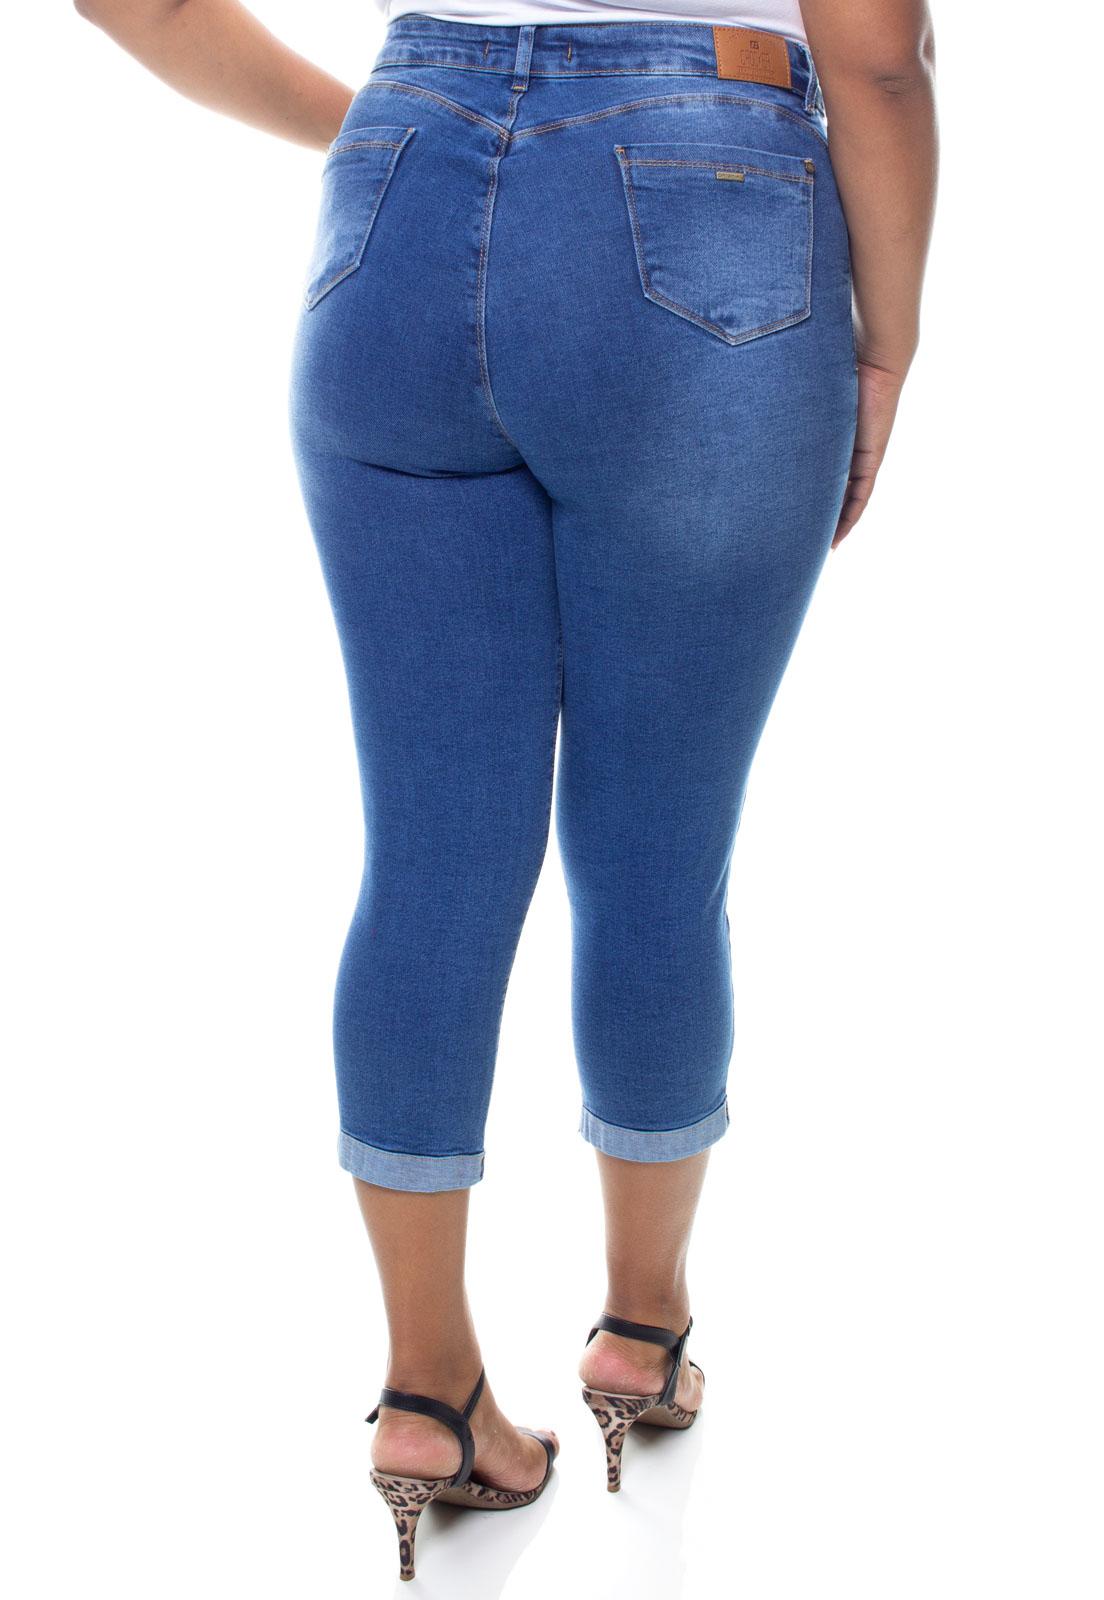 Calça Capri Jeans Feminina Plus Size Crocker - 47755  - CROCKER JEANS